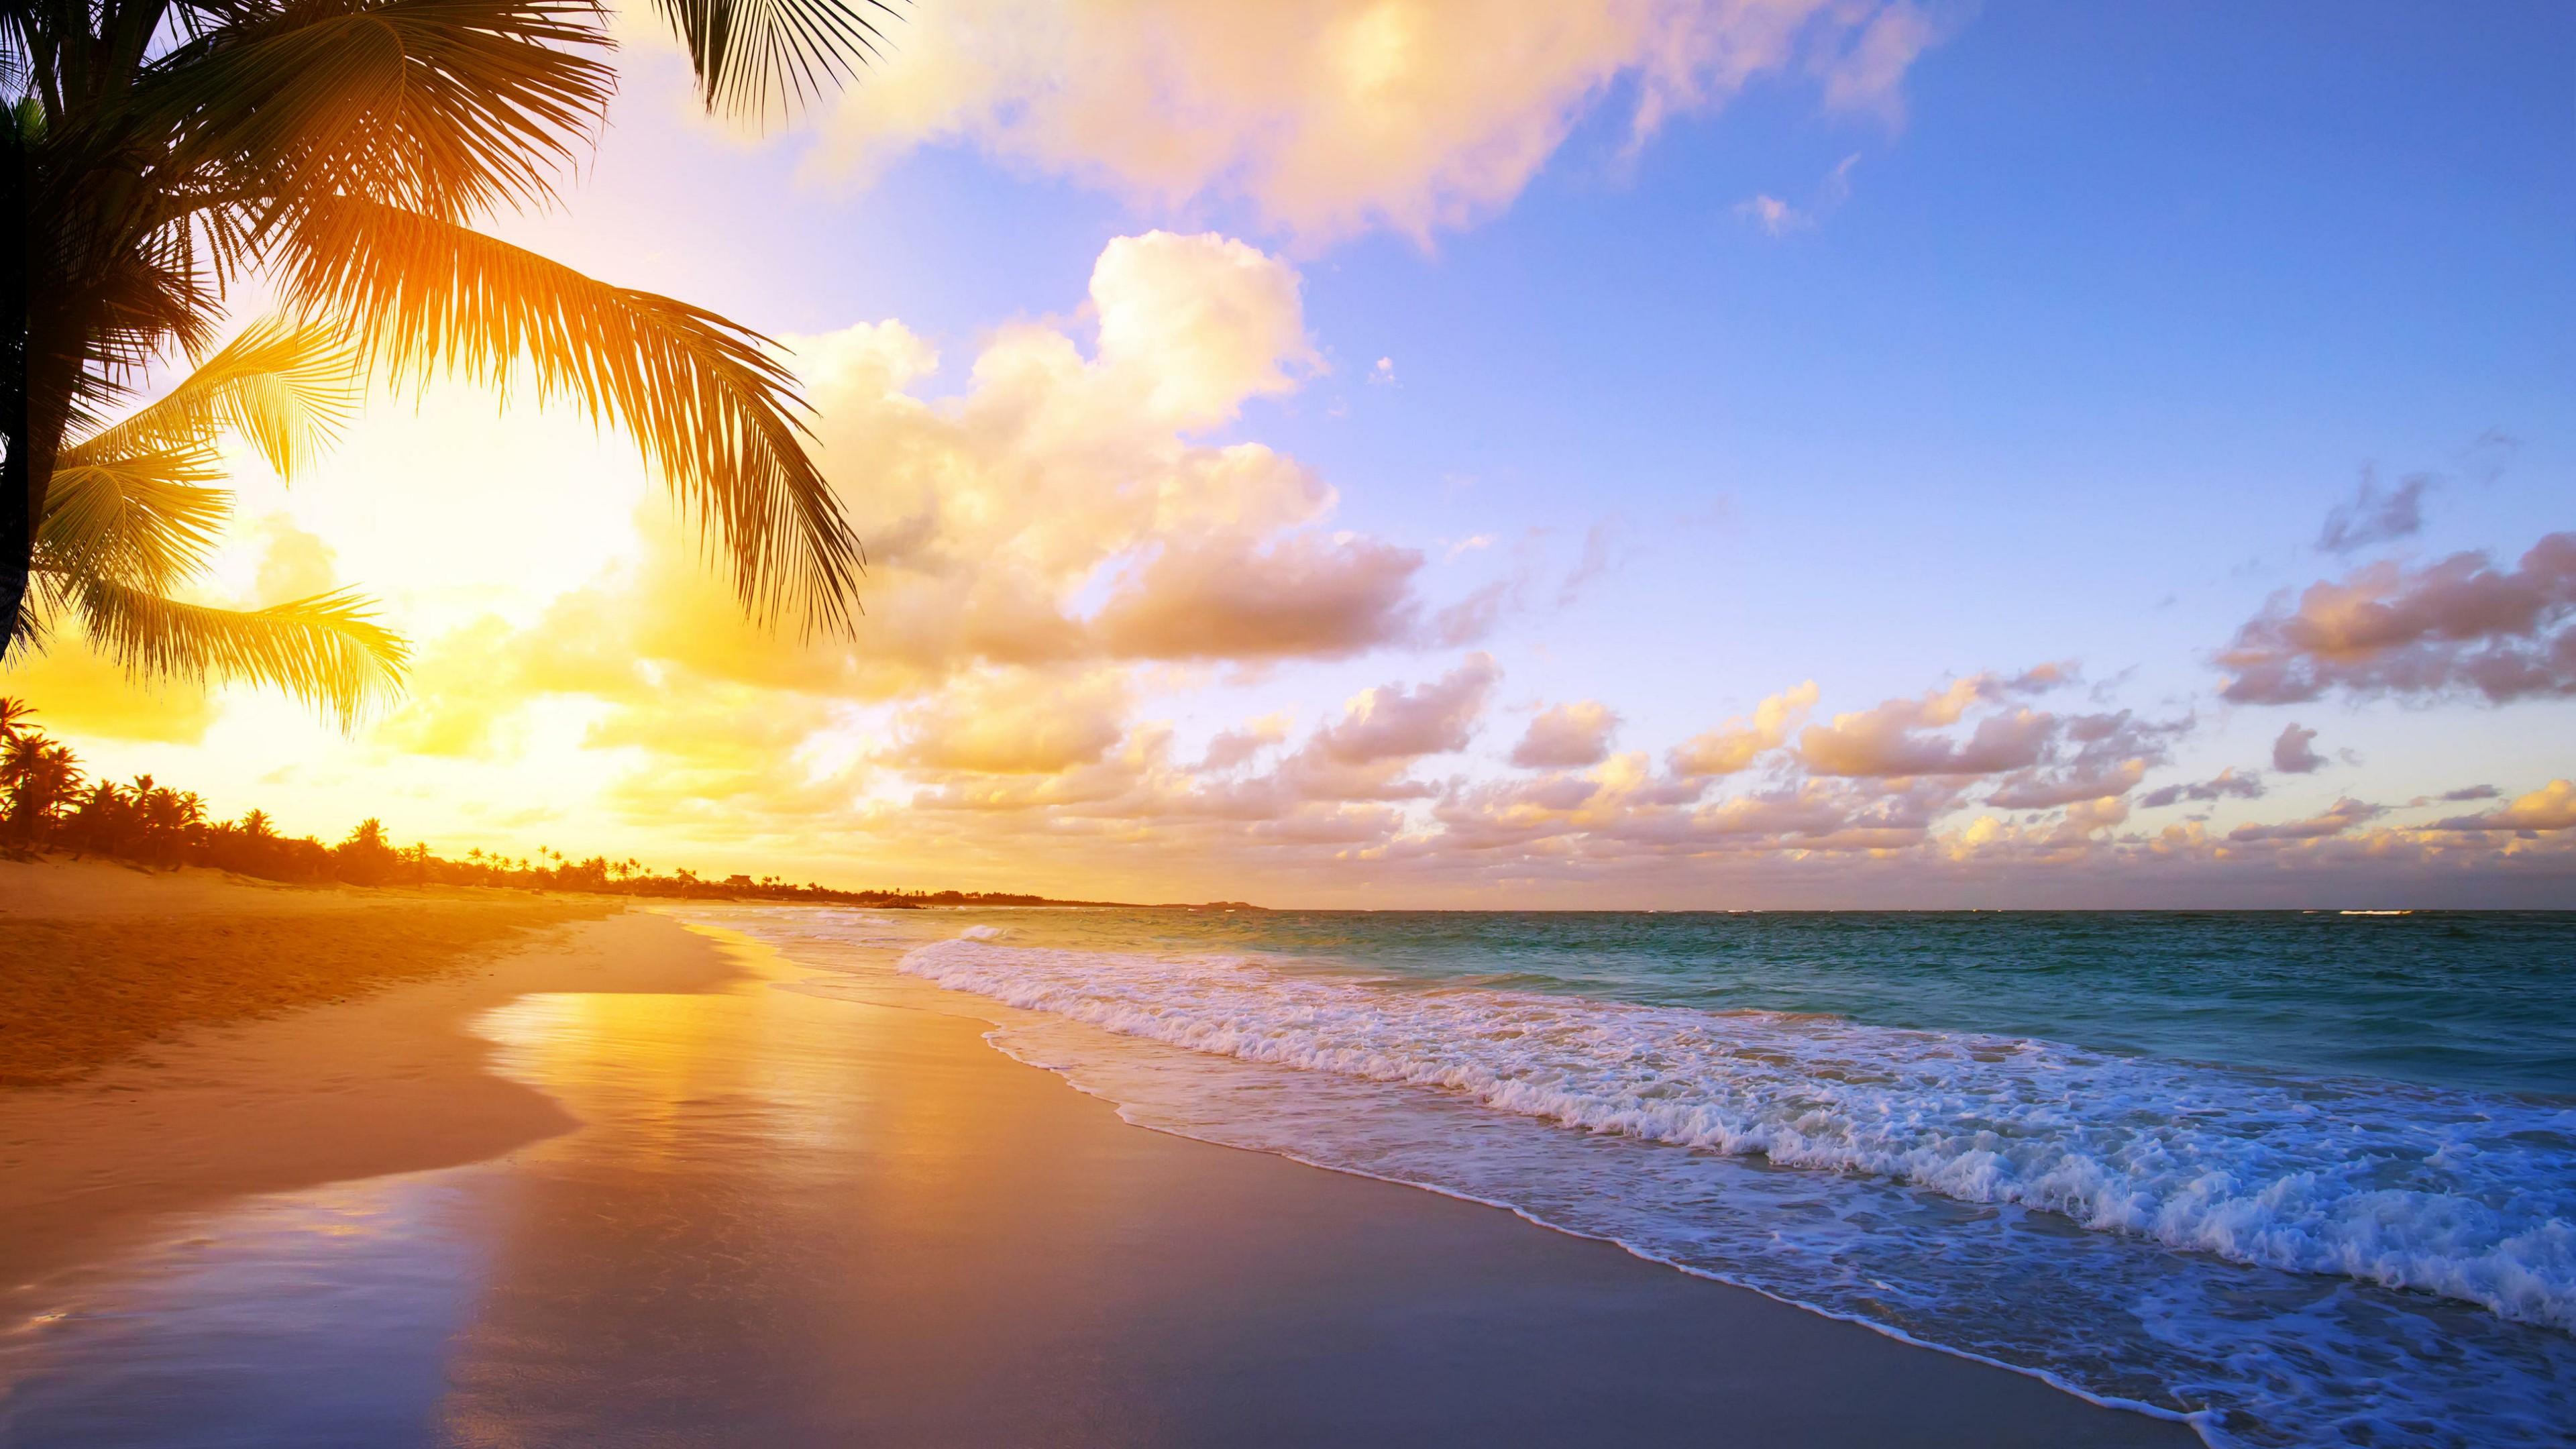 Tropical Beach Sunrise Wallpaper   Wallpaper Studio 10   Tens of ...